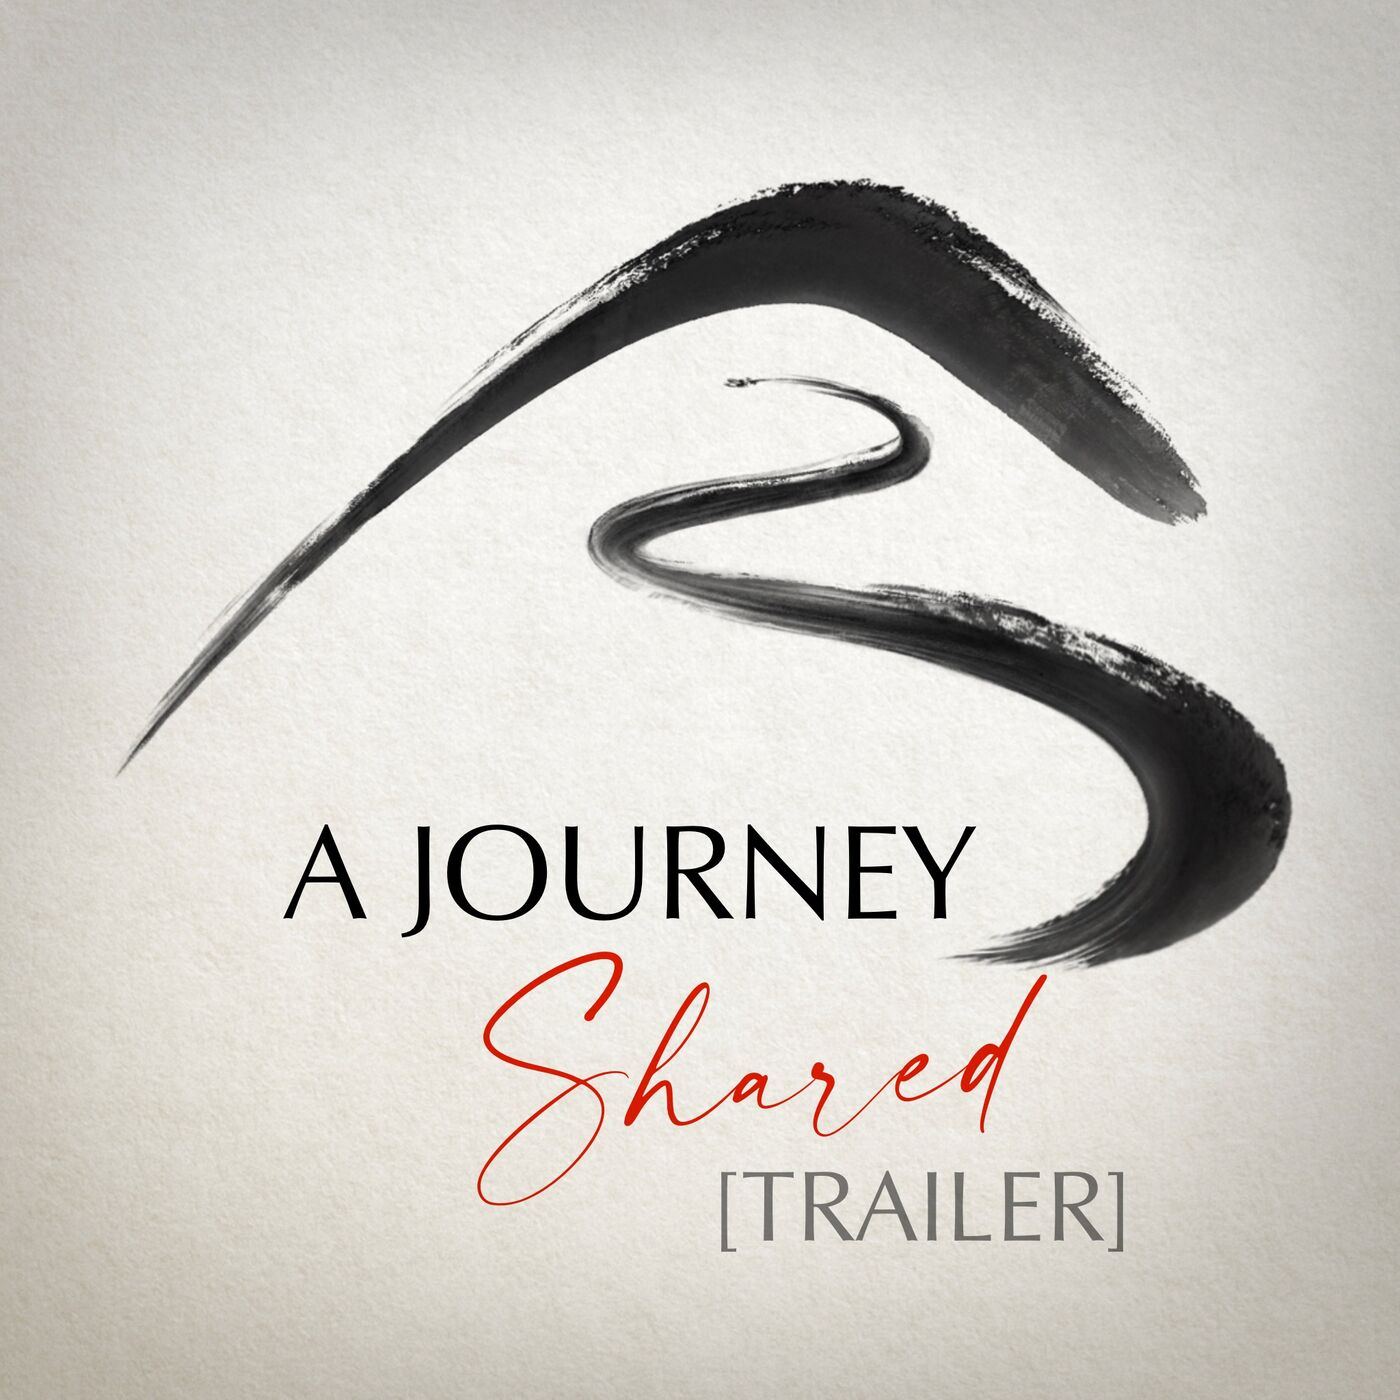 A Journey Shared (trailer)